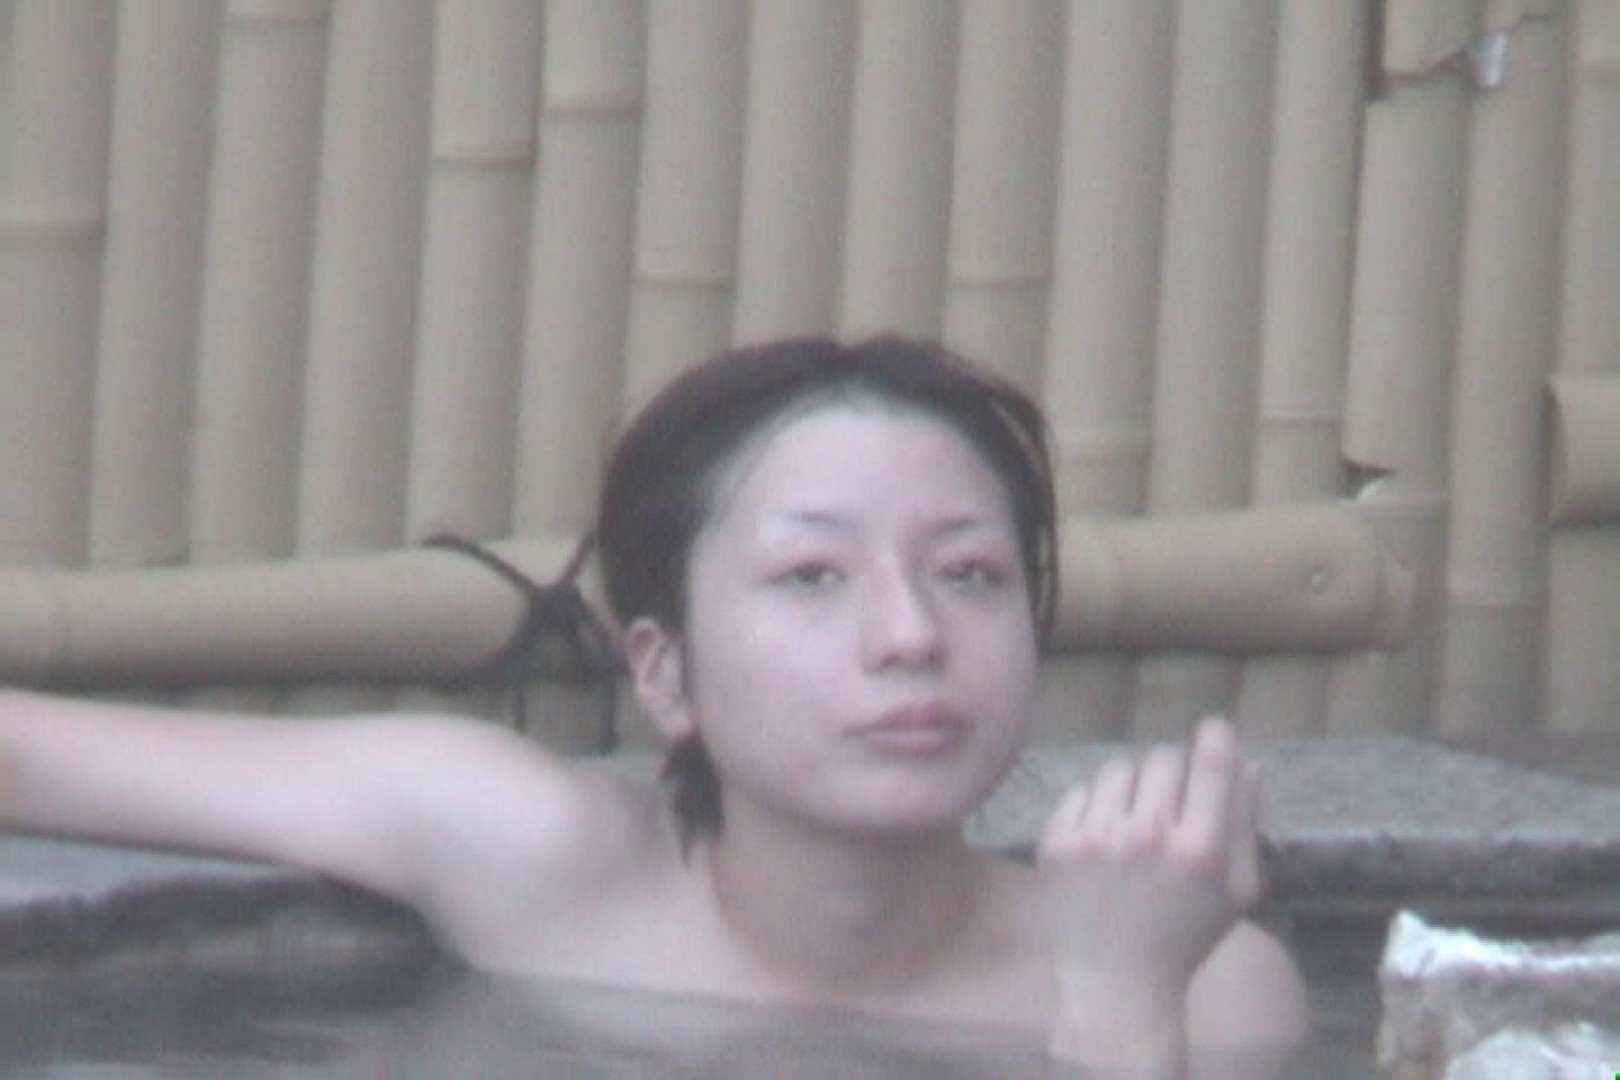 Aquaな露天風呂Vol.608 美しいOLの裸体 AV動画キャプチャ 95pic 11